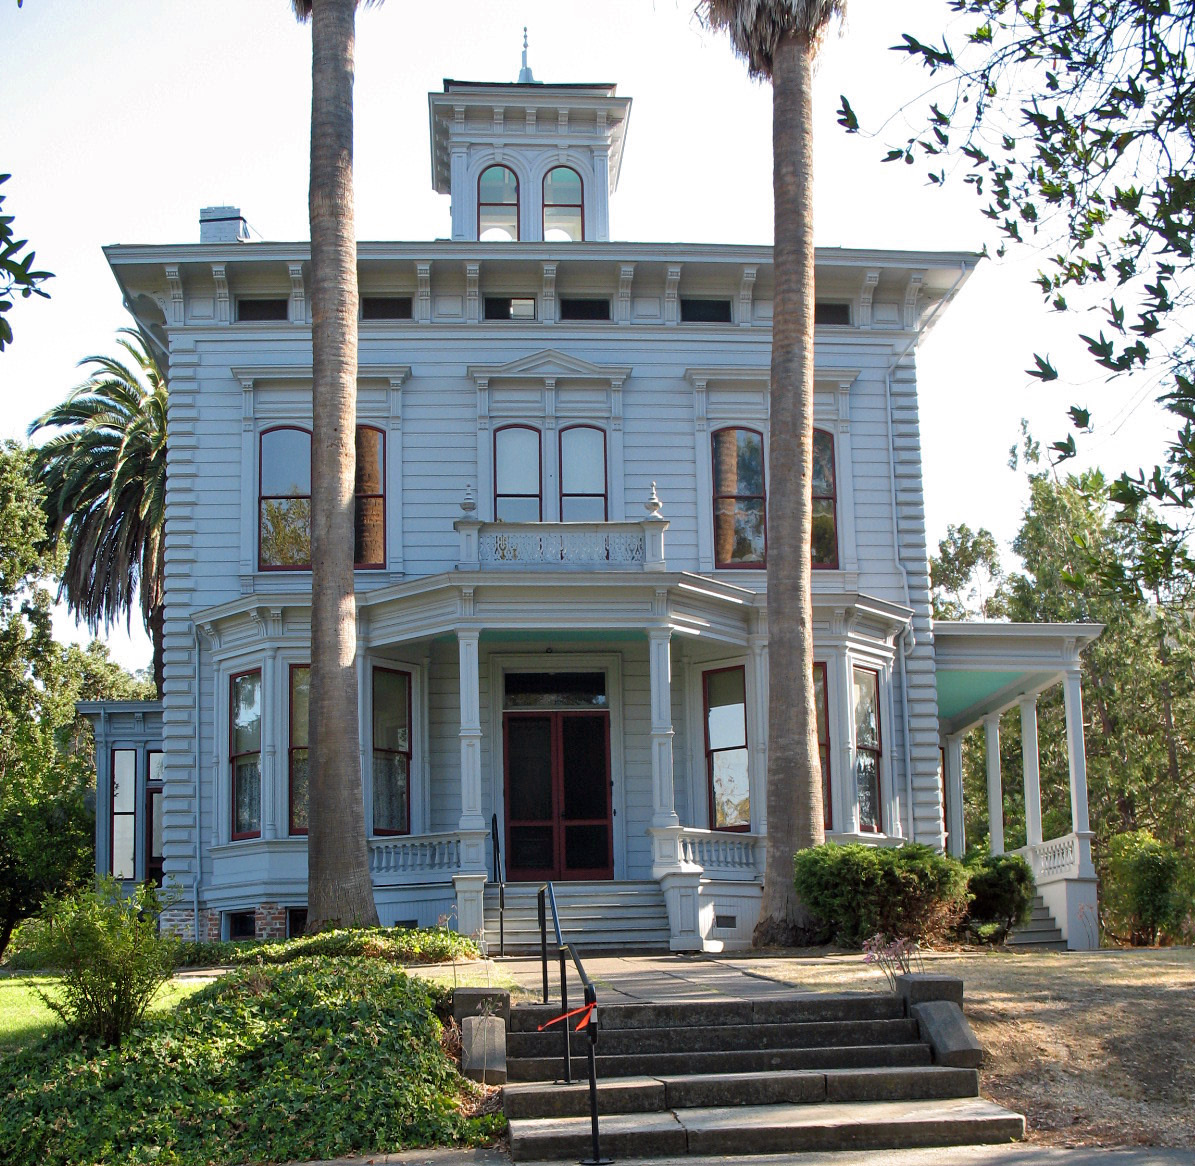 Home_security_System_Martinez_Contra_Costa_County_California